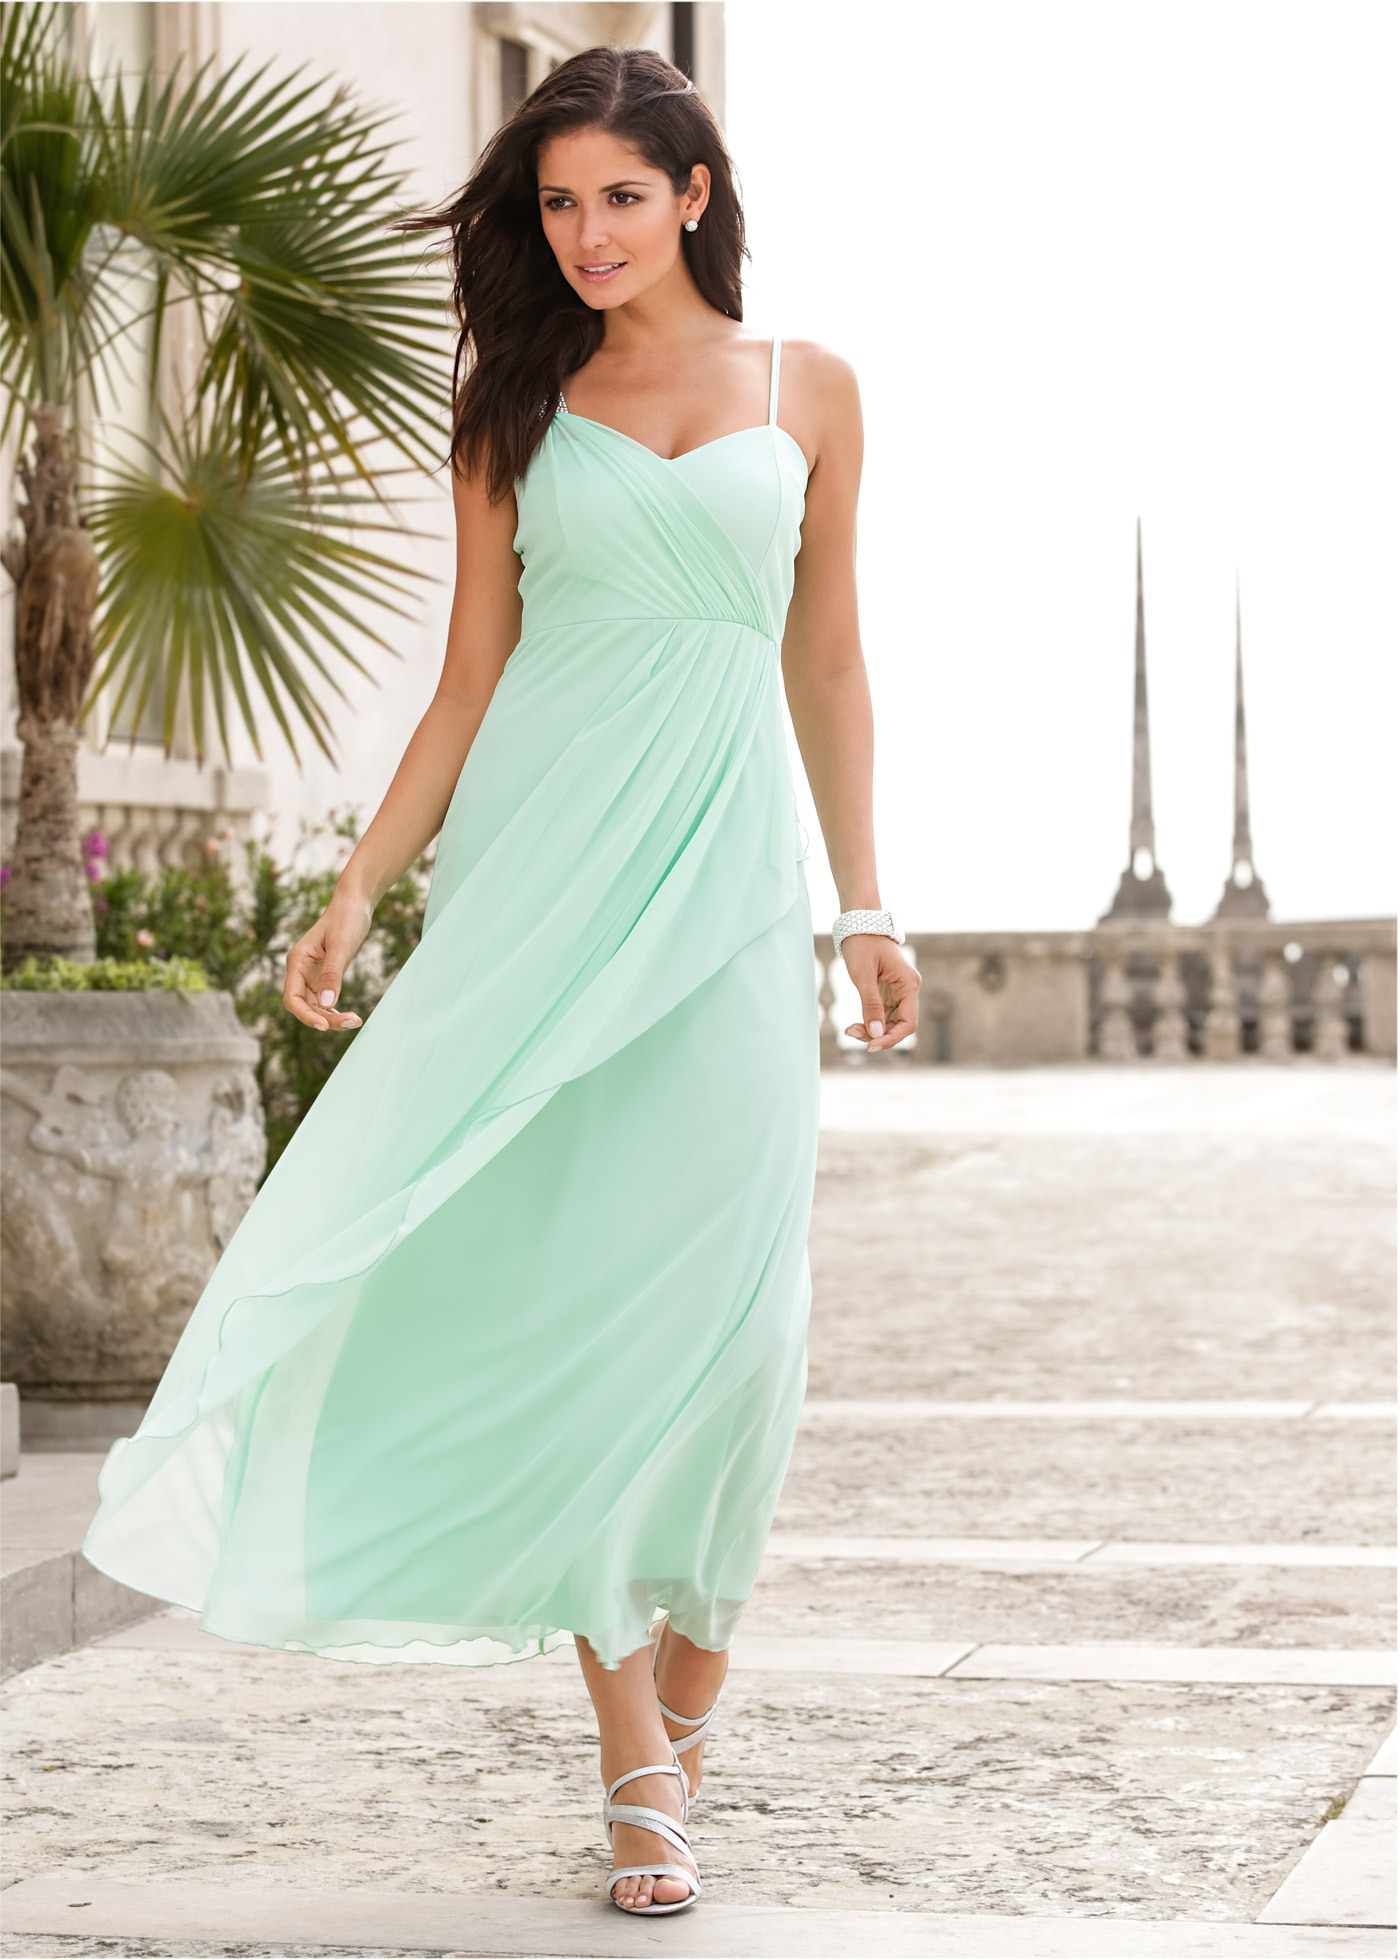 Bonprix Glamorous Maxi Dress With Decorative Element